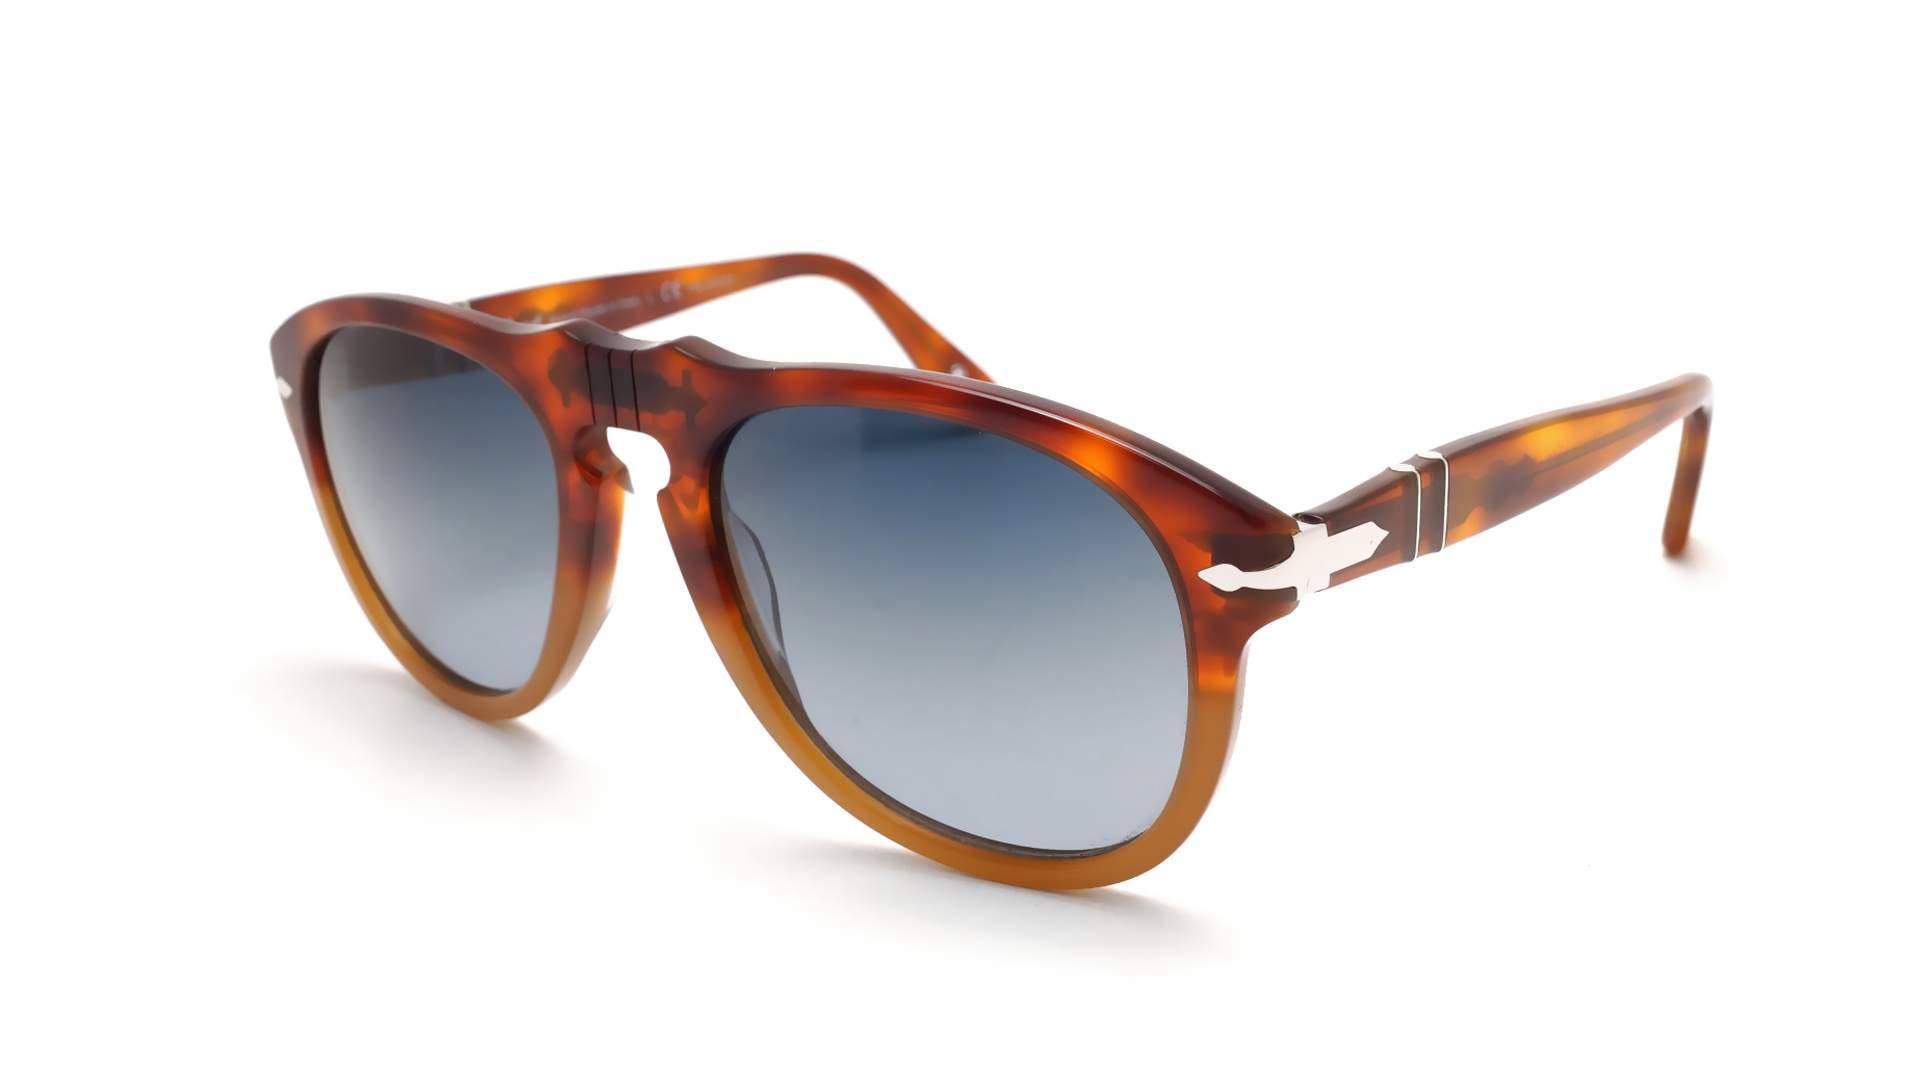 727040929ac Sunglasses Persol PO0649 1025 S3 54-20 medium Resina e Sale Tortoise  Polarized